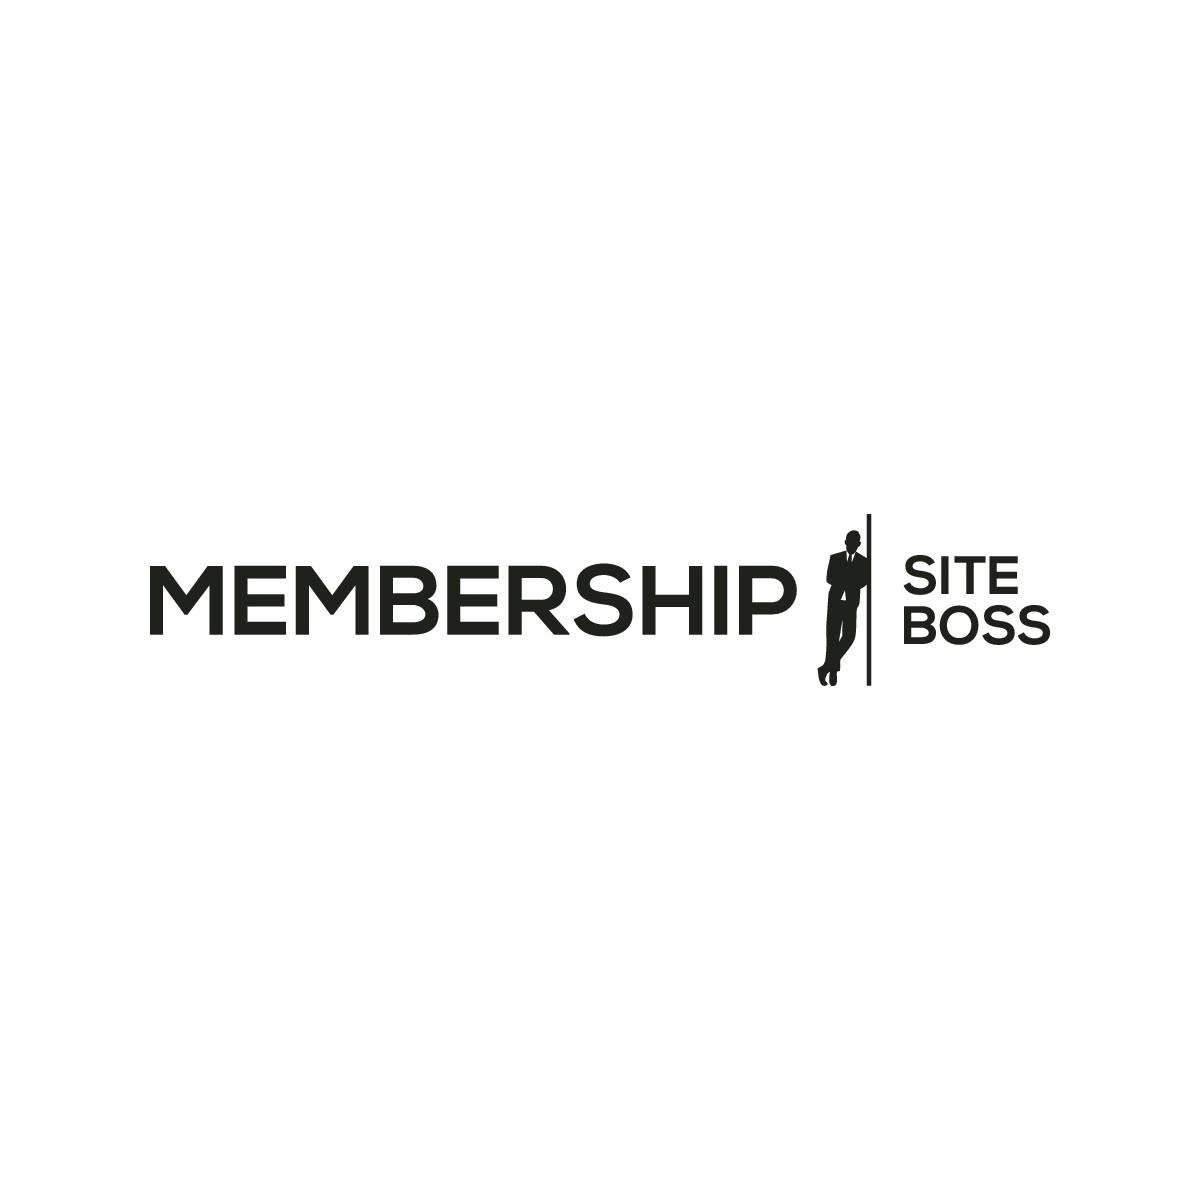 Create a sophisticated logo for MembershipSiteBoss.com